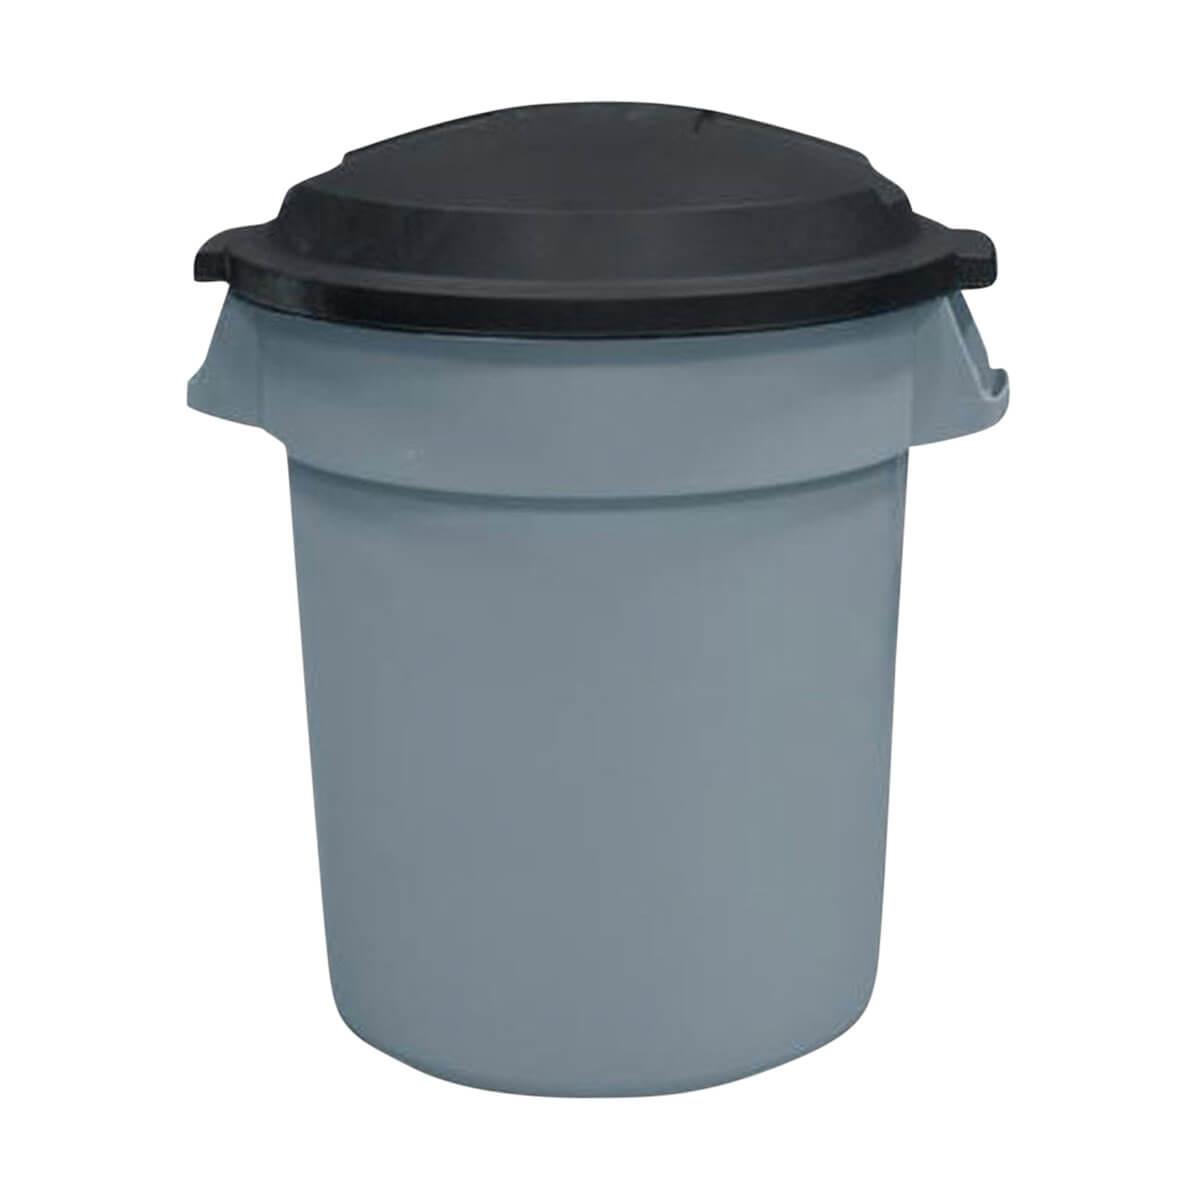 77L Rubbermaid Roughneck Trash Can